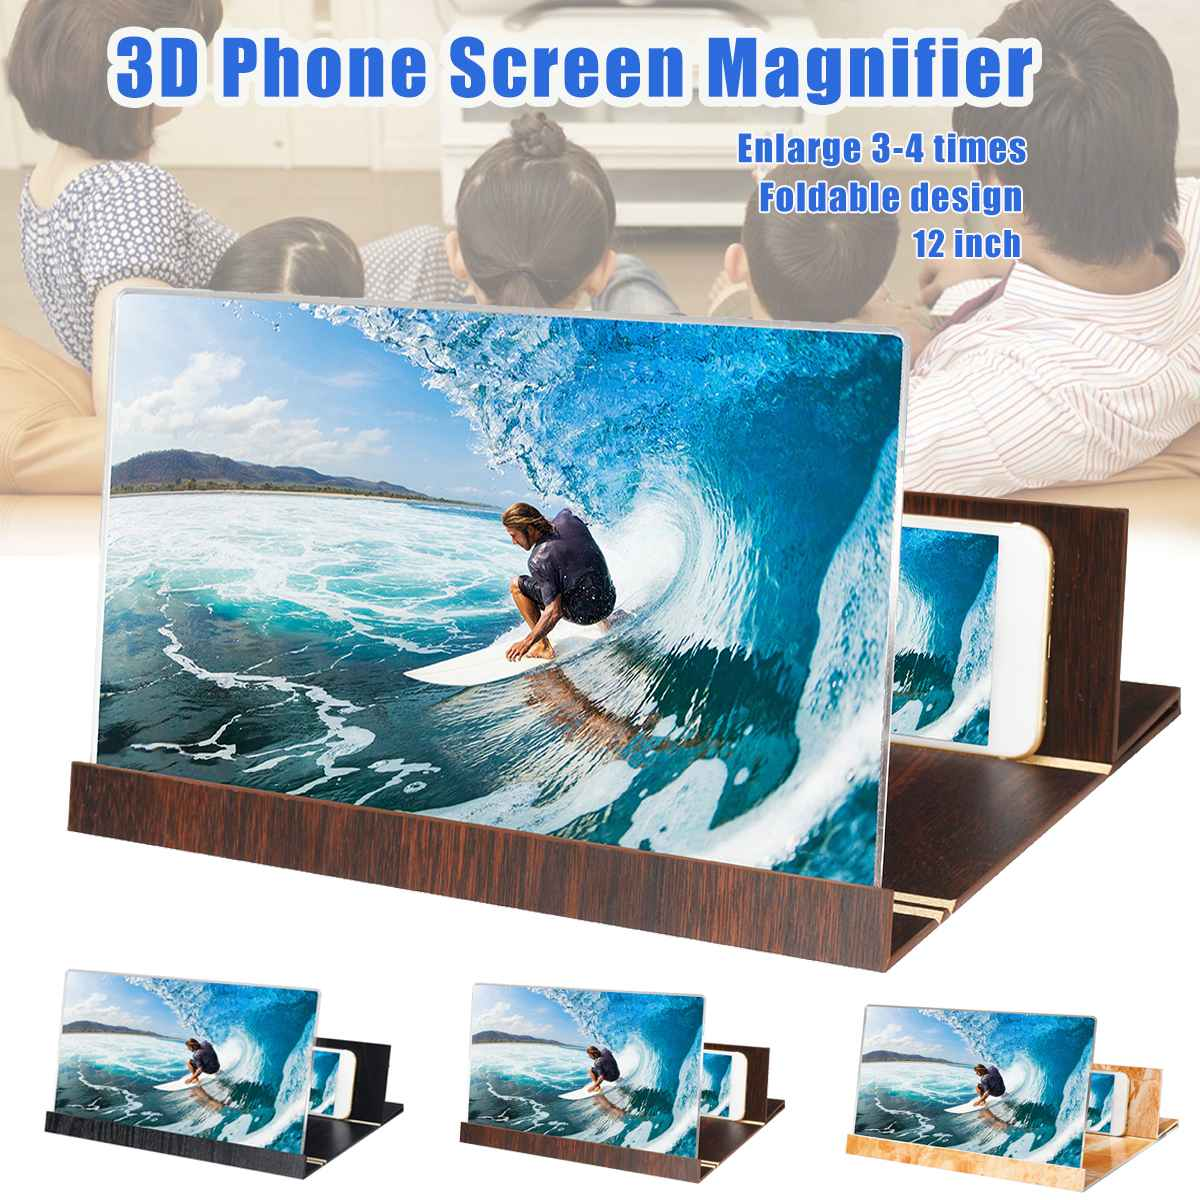 12 Inch 3d Phone Screen Magnifier Desktop Bracket Mobile Phone Video Magnifying Glass Smartphone Holder Mount Movie